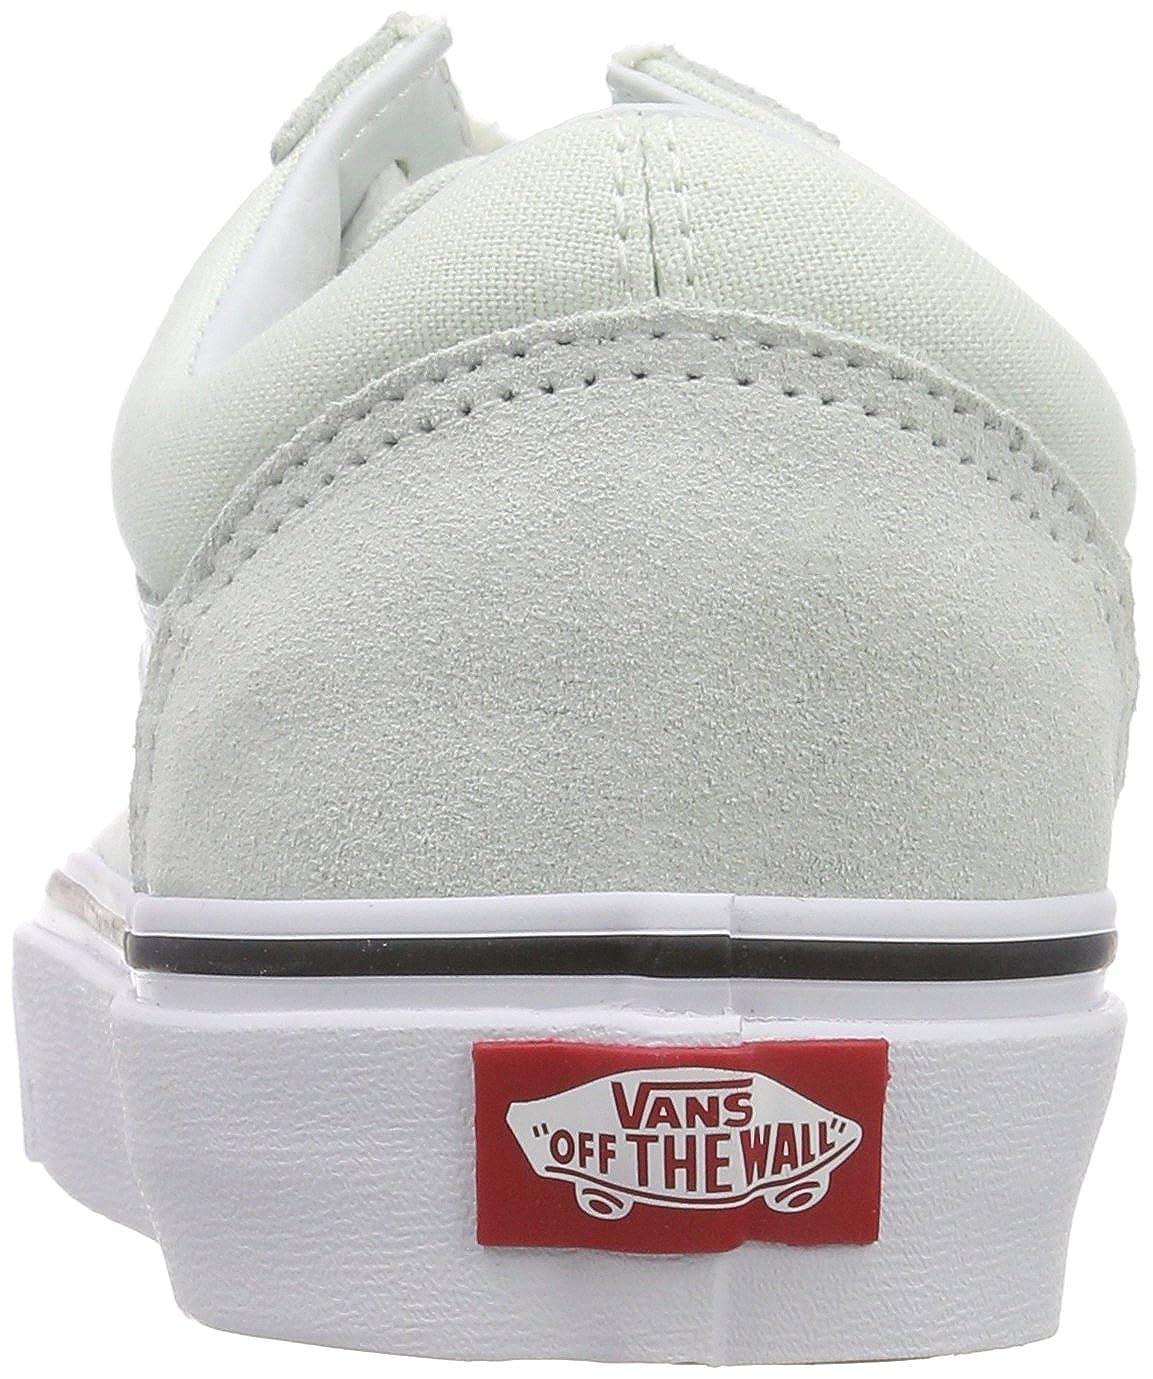 e422cbec4b6f Vans Women s Old Skool Trainers  Amazon.co.uk  Shoes   Bags